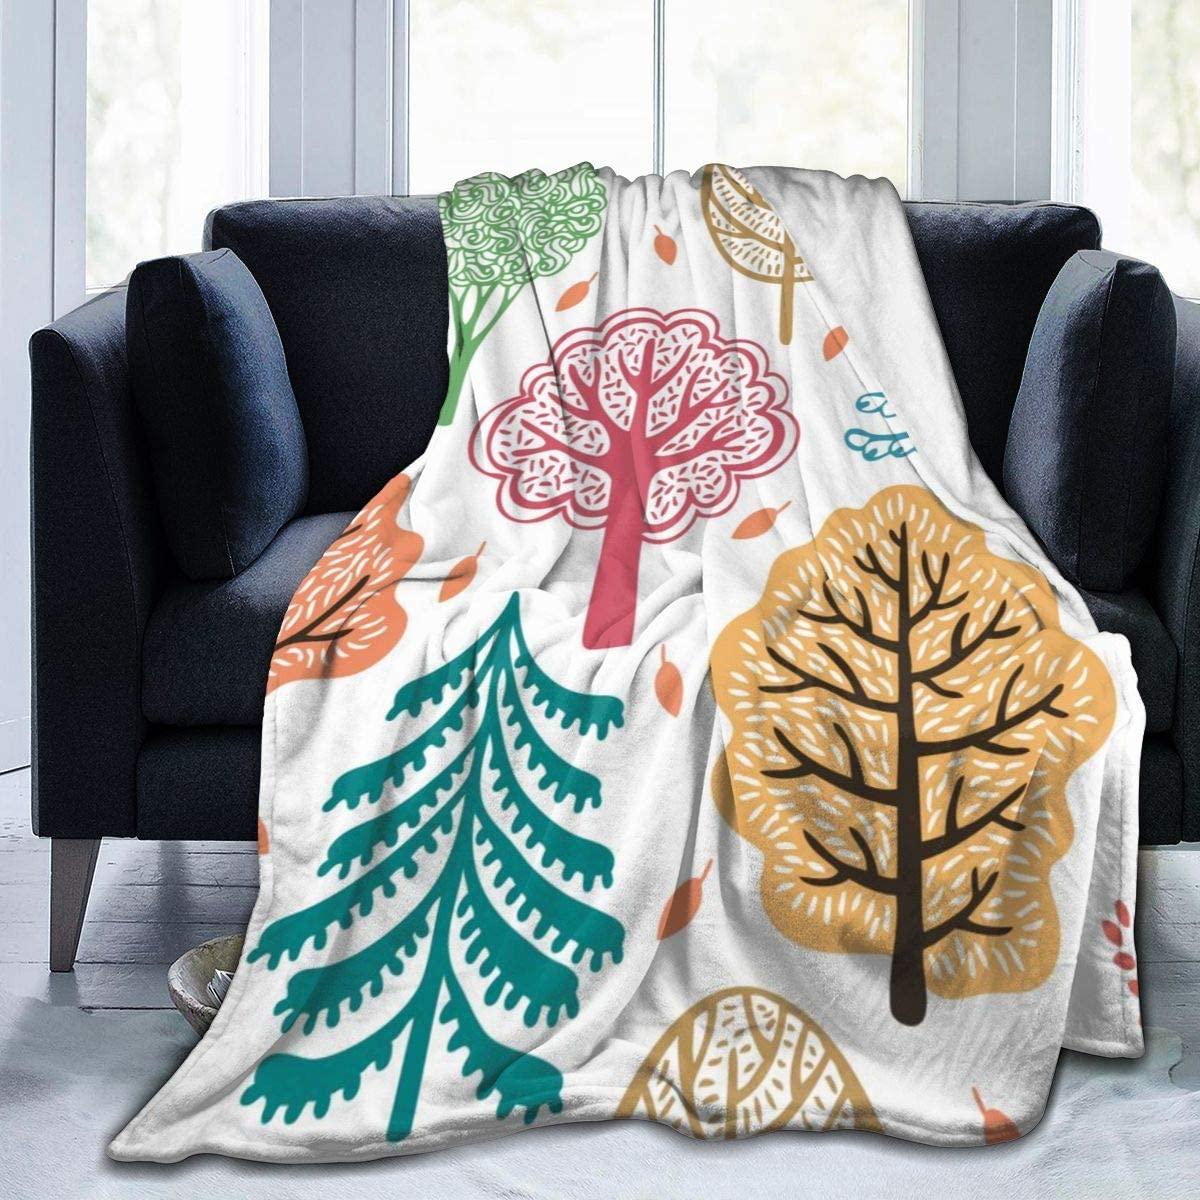 Micro Fleece Plush Soft Baby Blanket Autumn Forest Seamless Fluffy Warm Toddler Bed/Crib Blanket Lightweight Flannel Daycare Nap Kids Sleeping Tummy Time Throw Blanket Girls Boy Clearance Kid/Baby